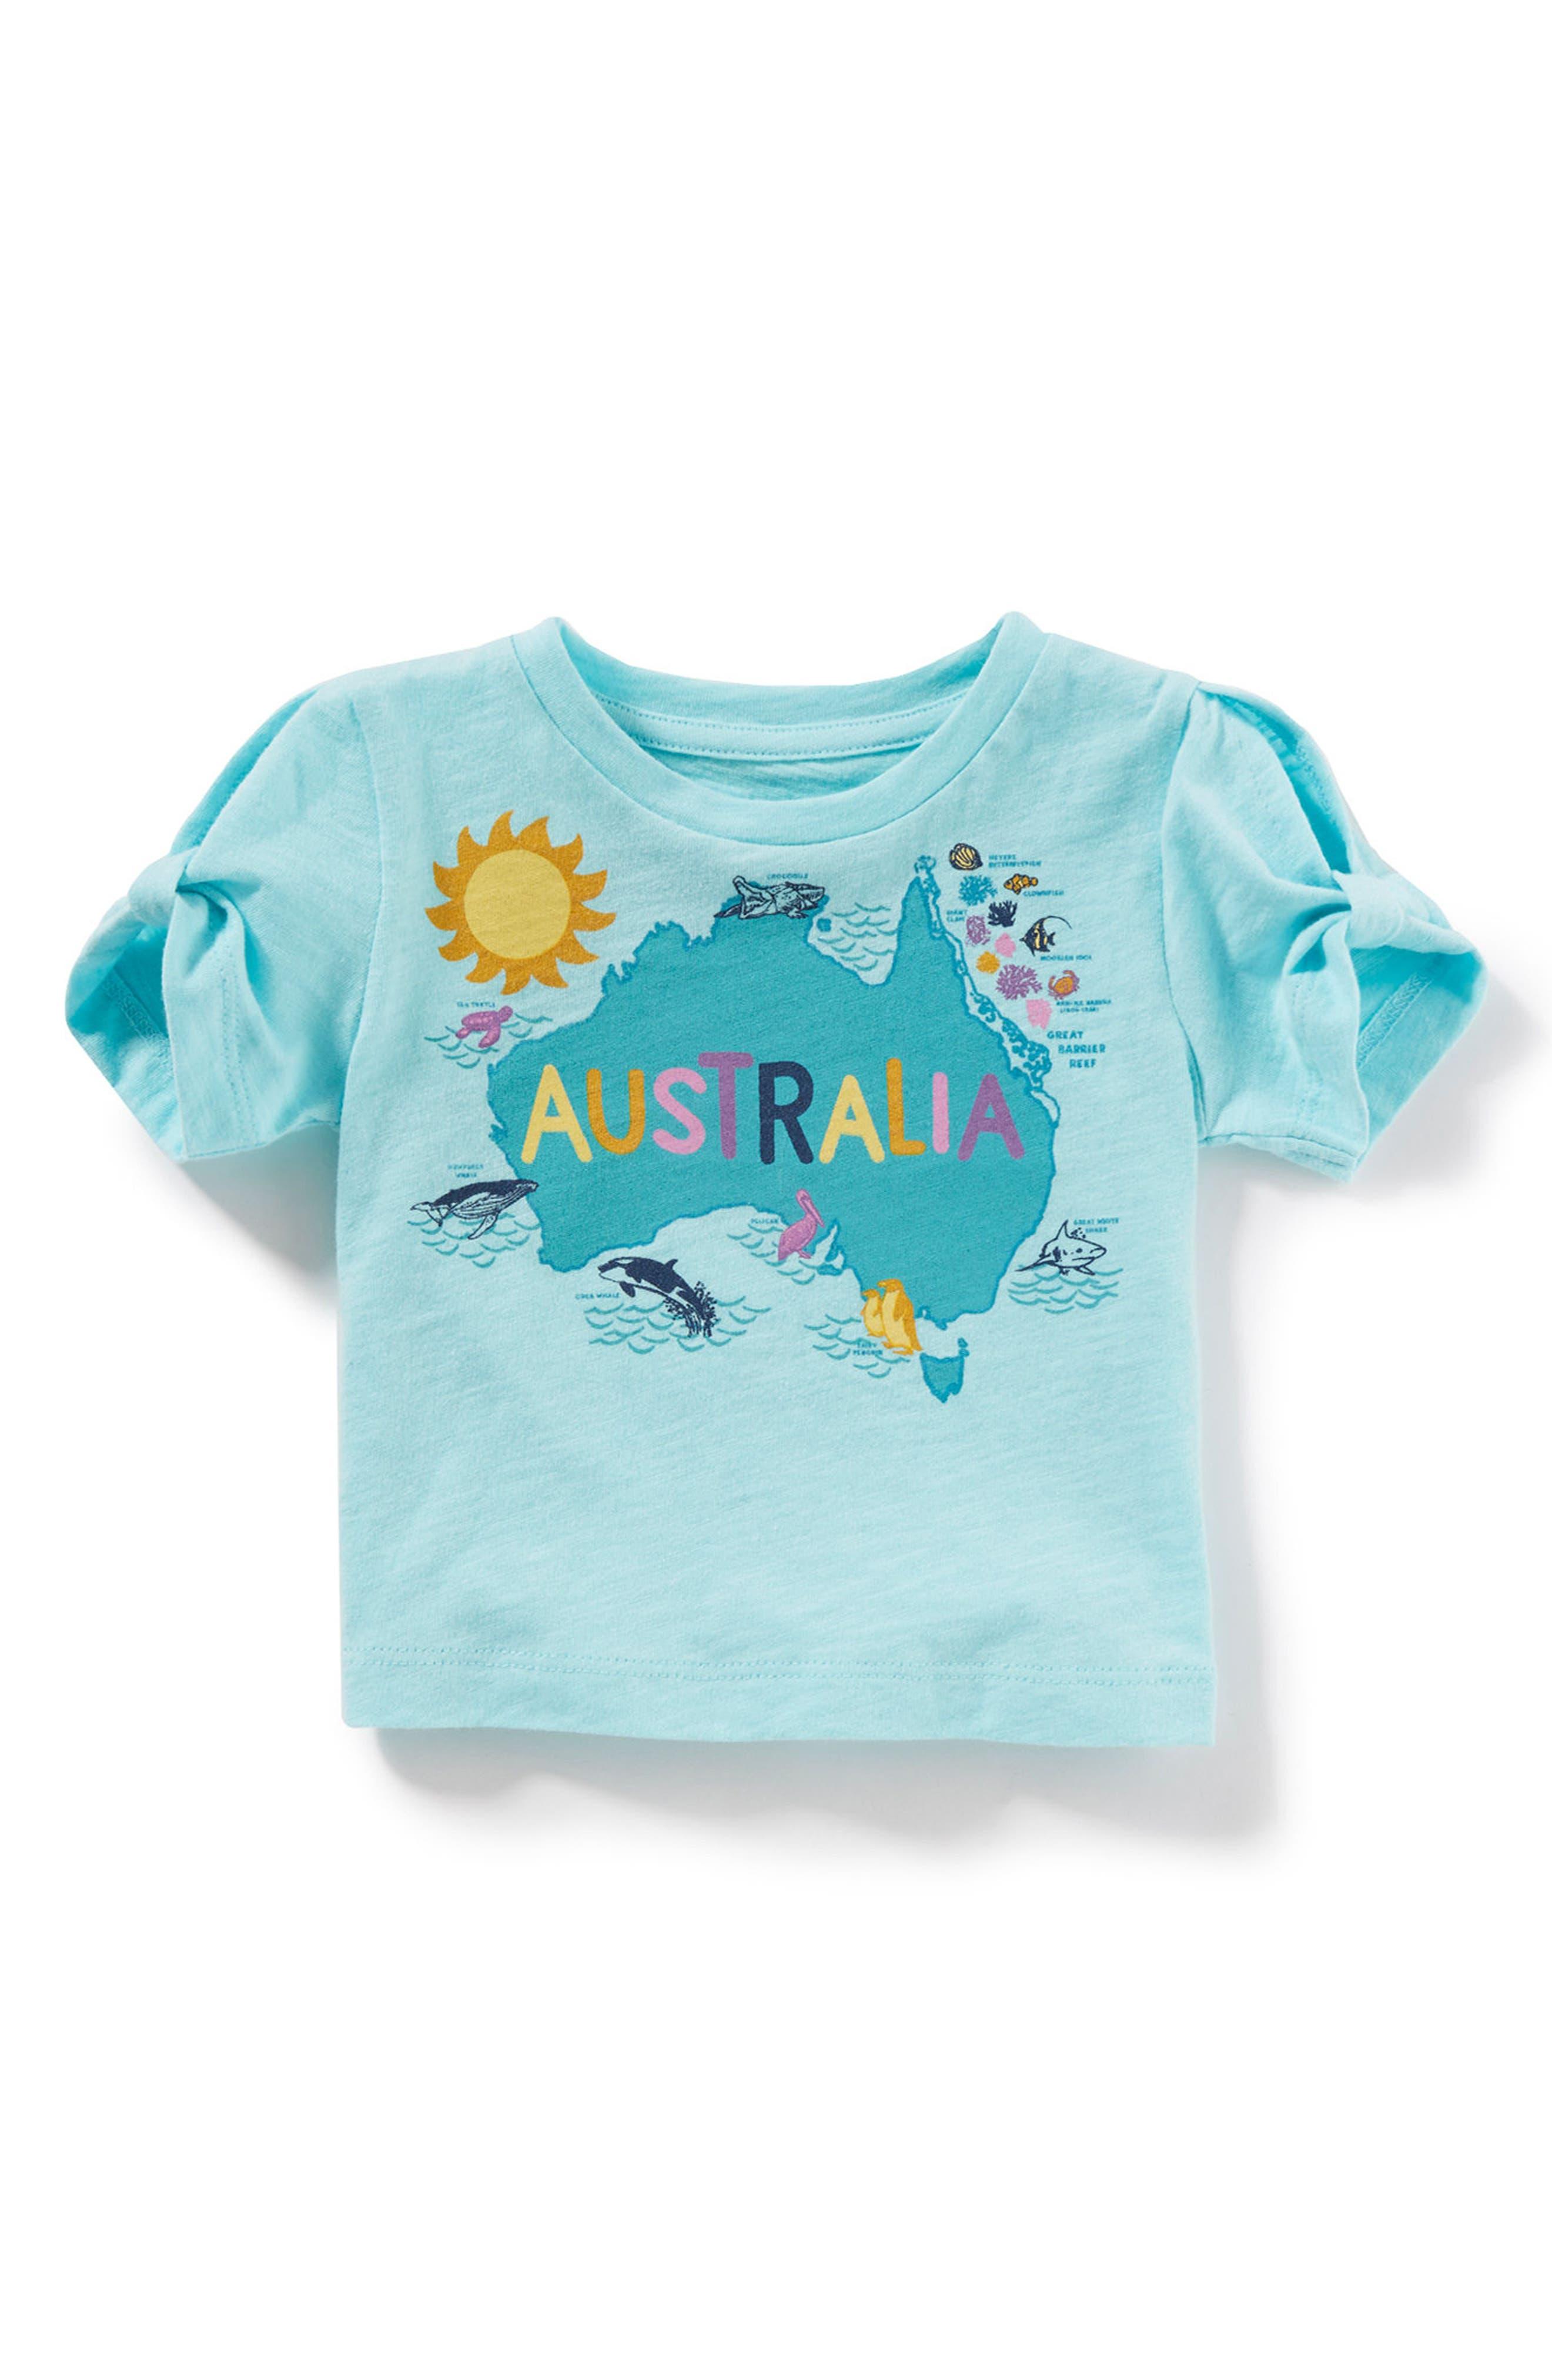 Australia Tee,                             Main thumbnail 1, color,                             Aqua